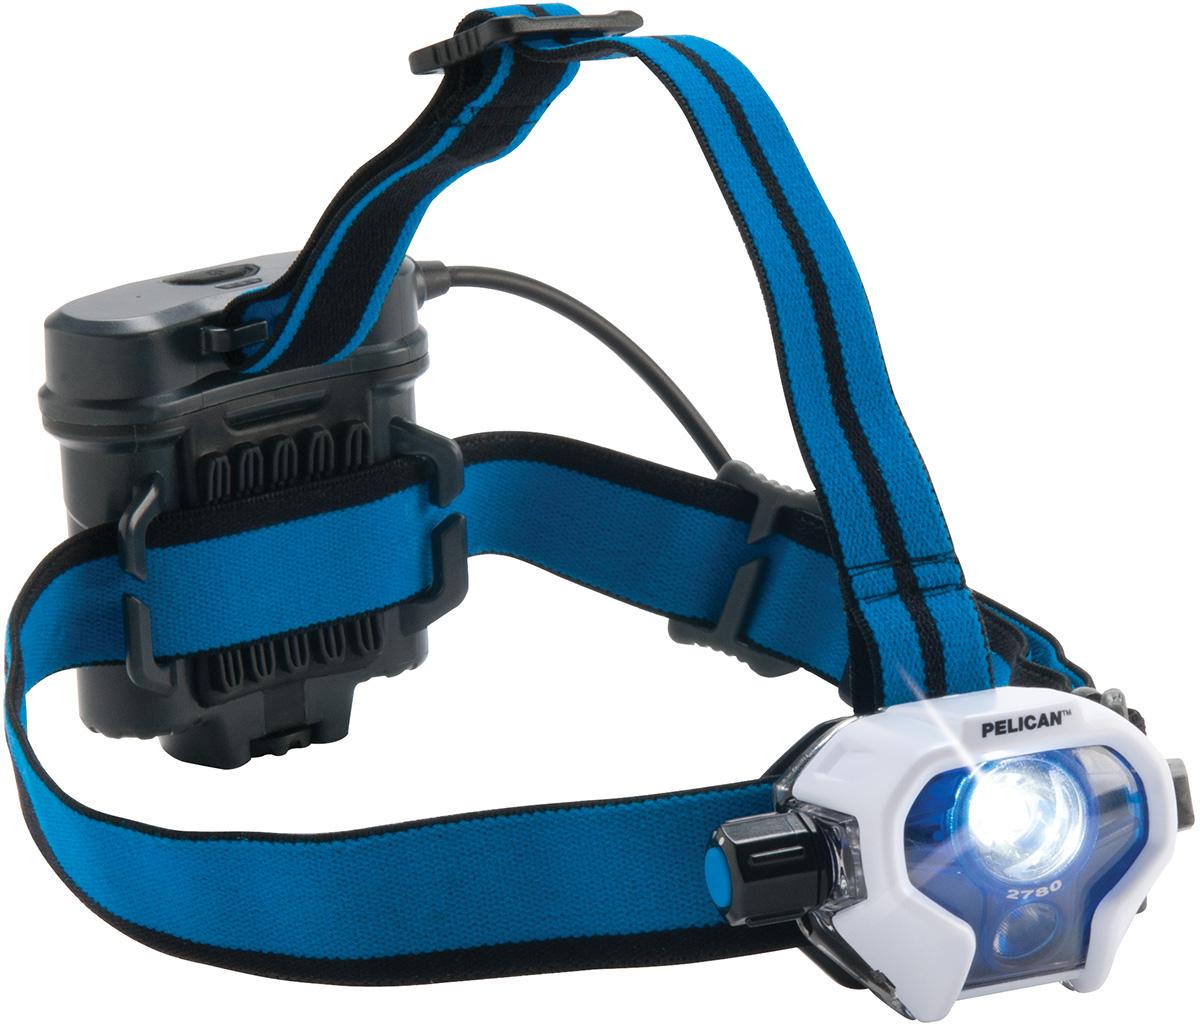 pelican peli products 2780 best progear led bright headlamp